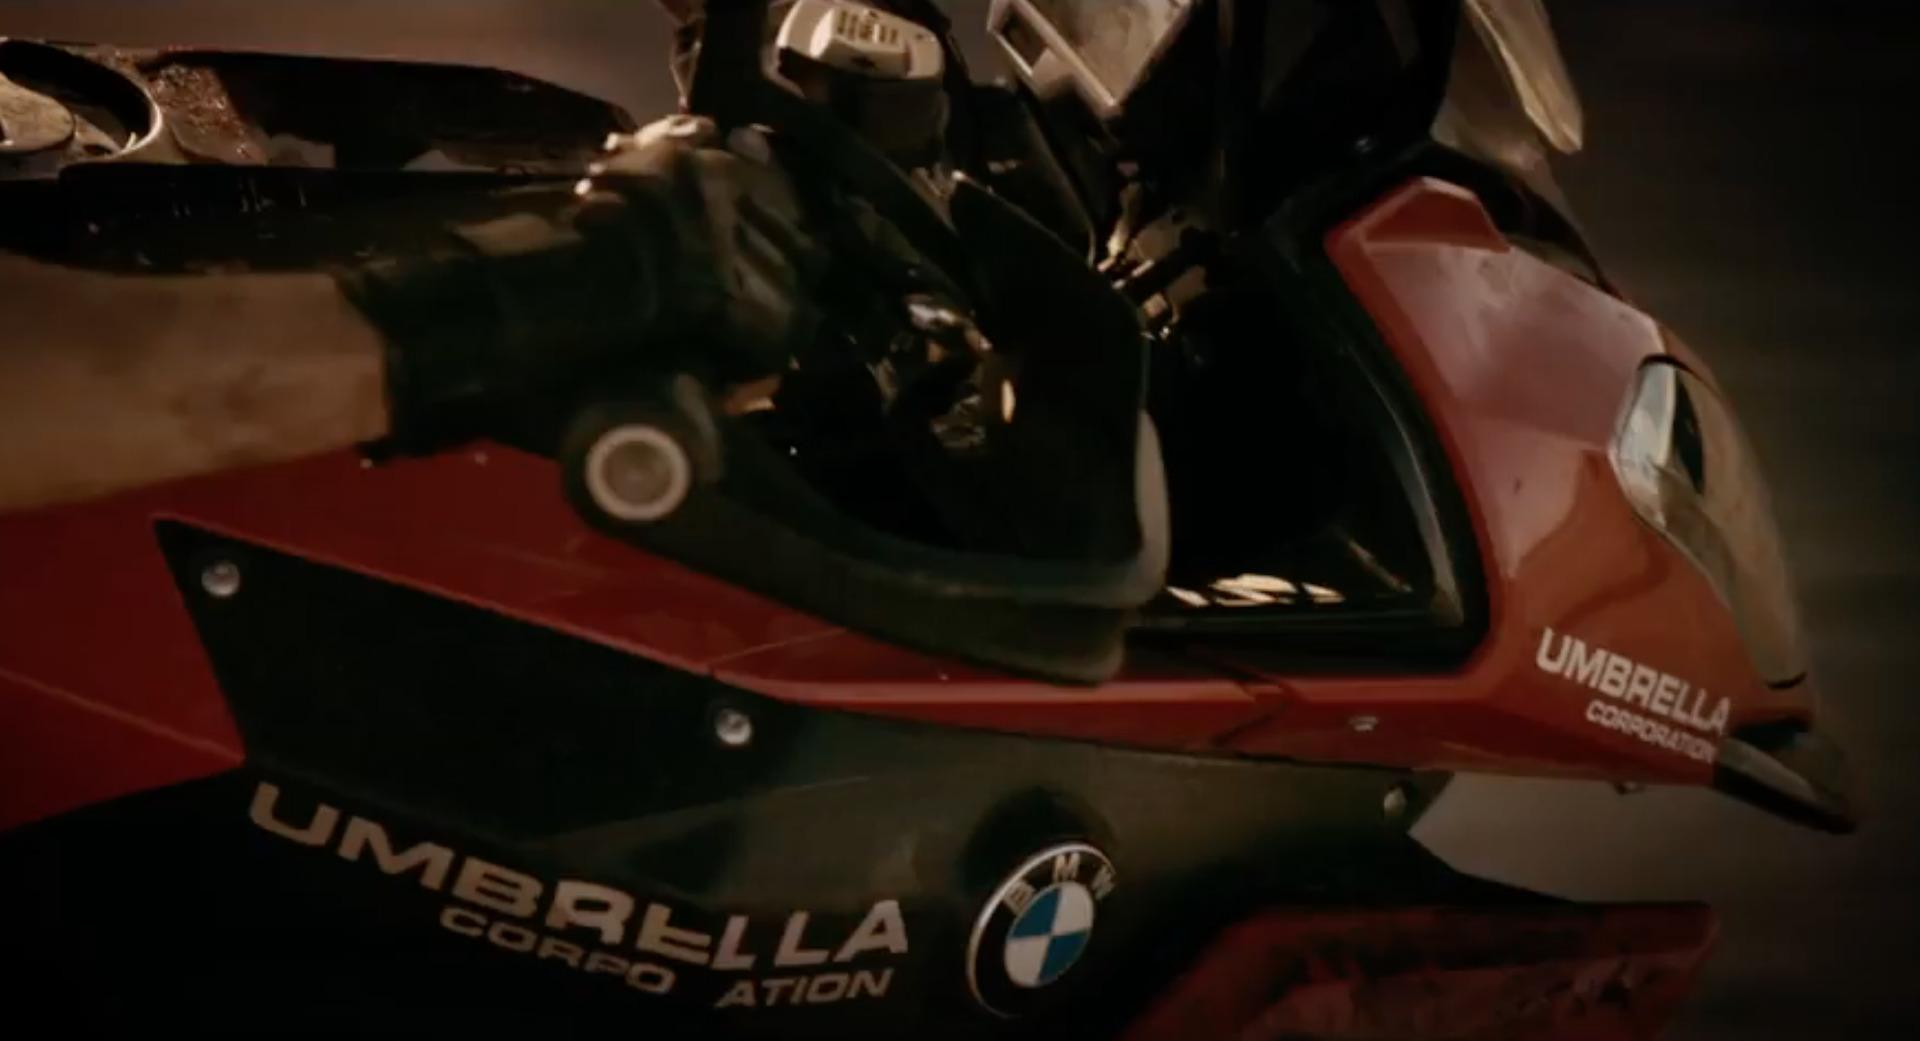 Bmw Motorrad Platziert Sich In Resident Evil The Final